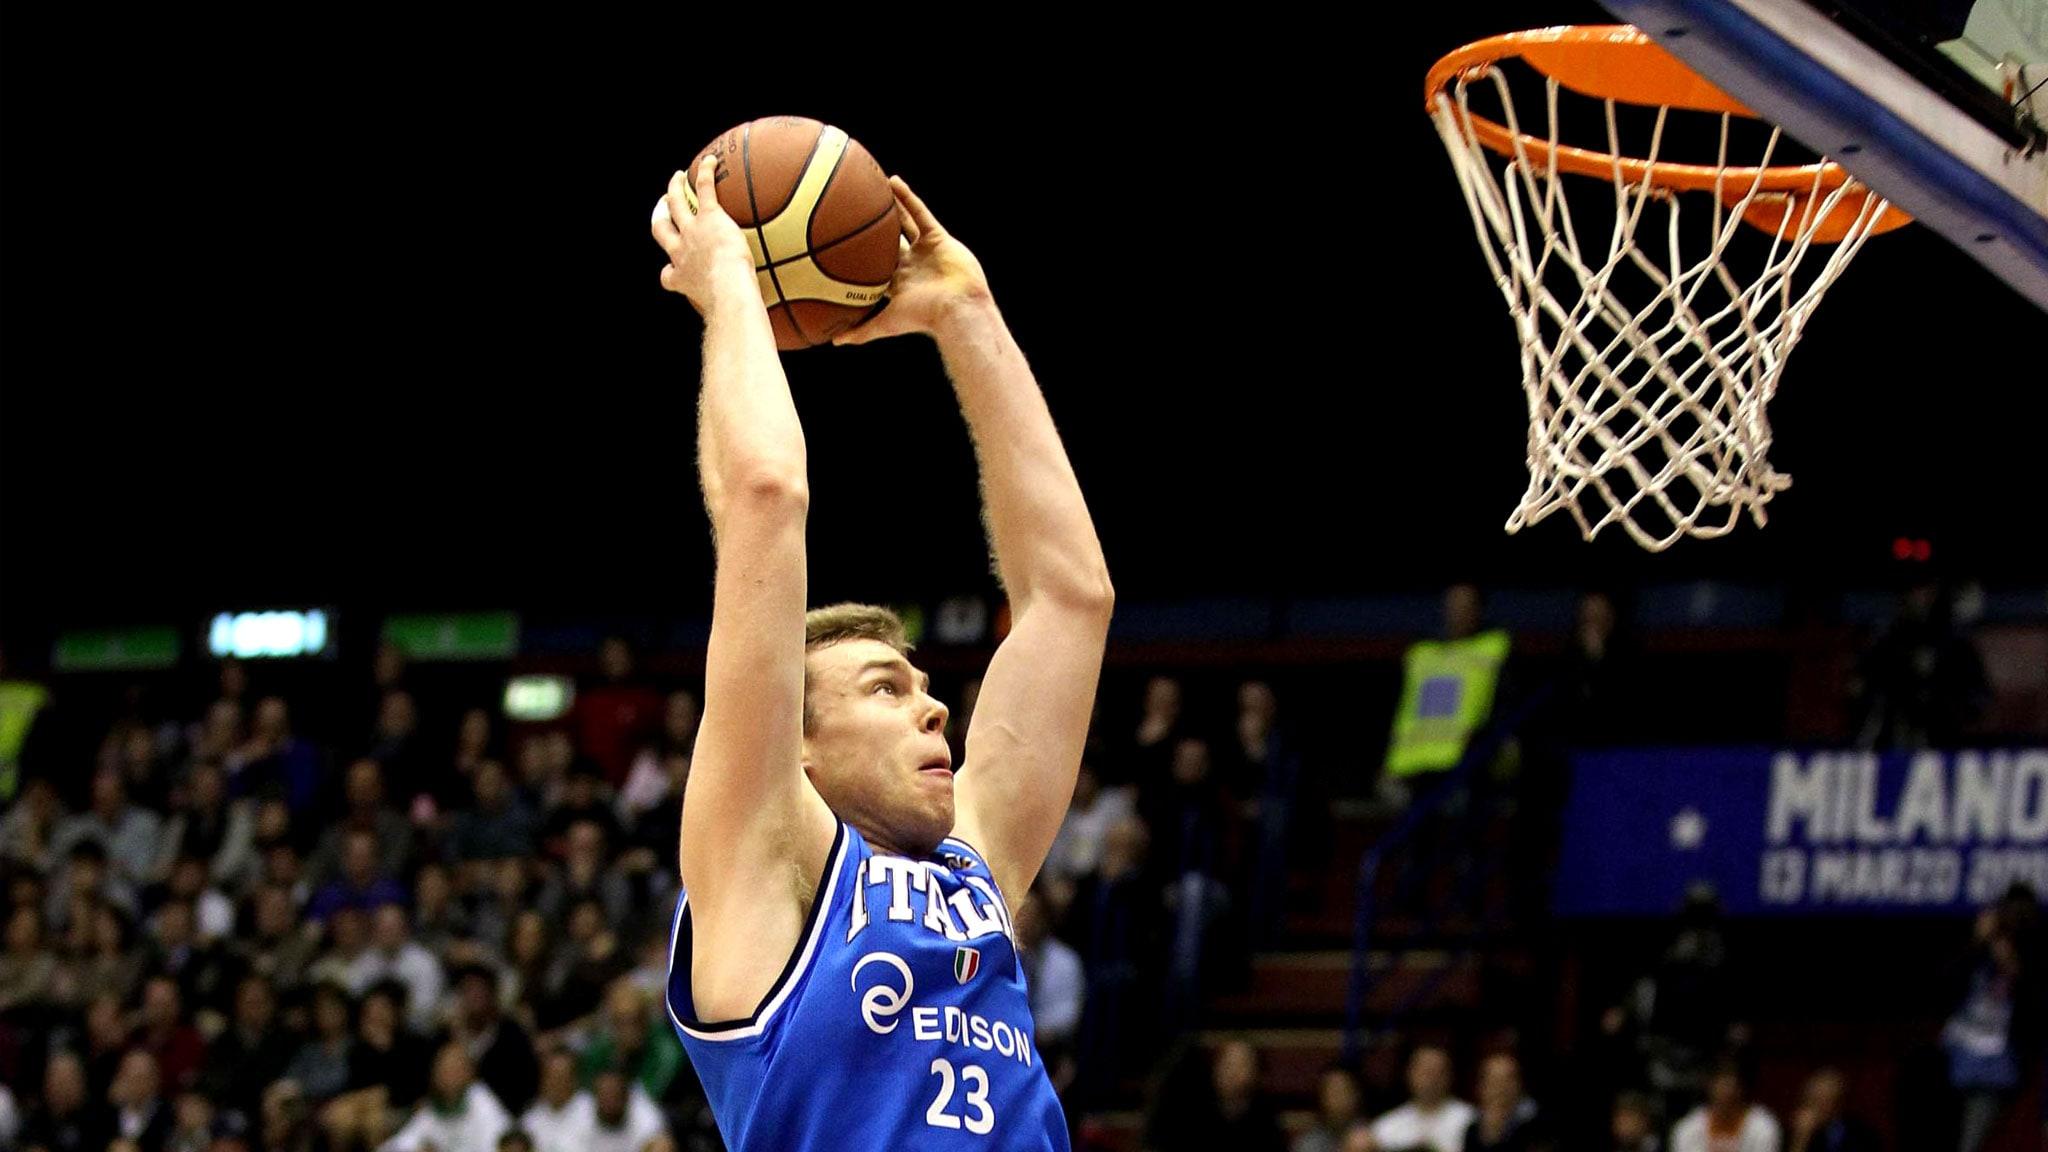 Rai Sport+ HD Basket: Torneo Qualificazione Olimpica - Finale: Italia - Serbia